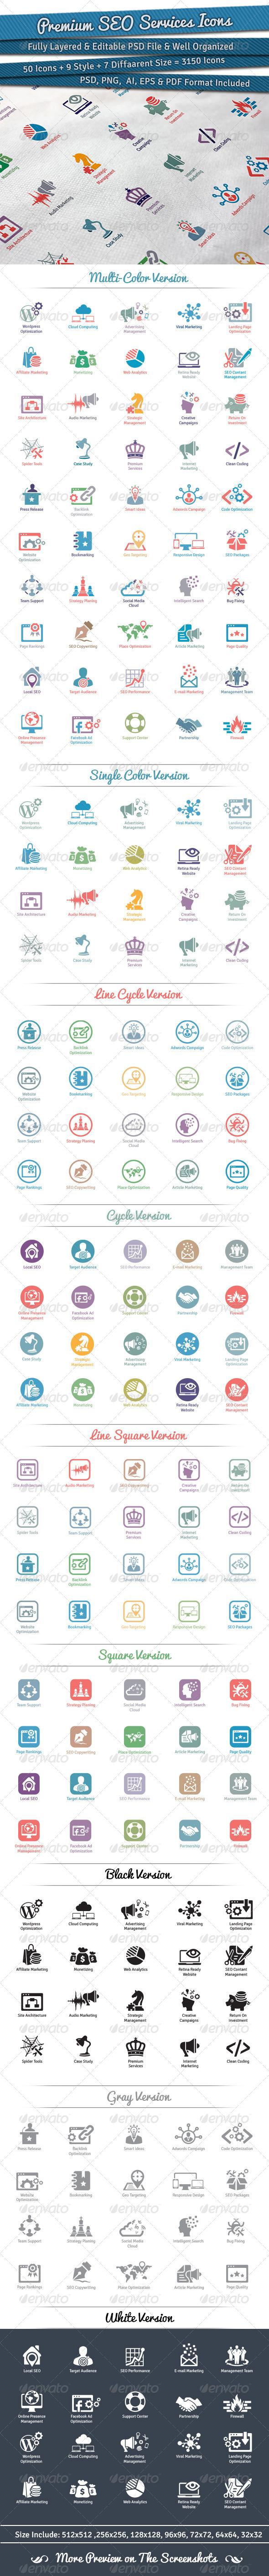 GraphicRiver Premium SEO Services Icons 5756203